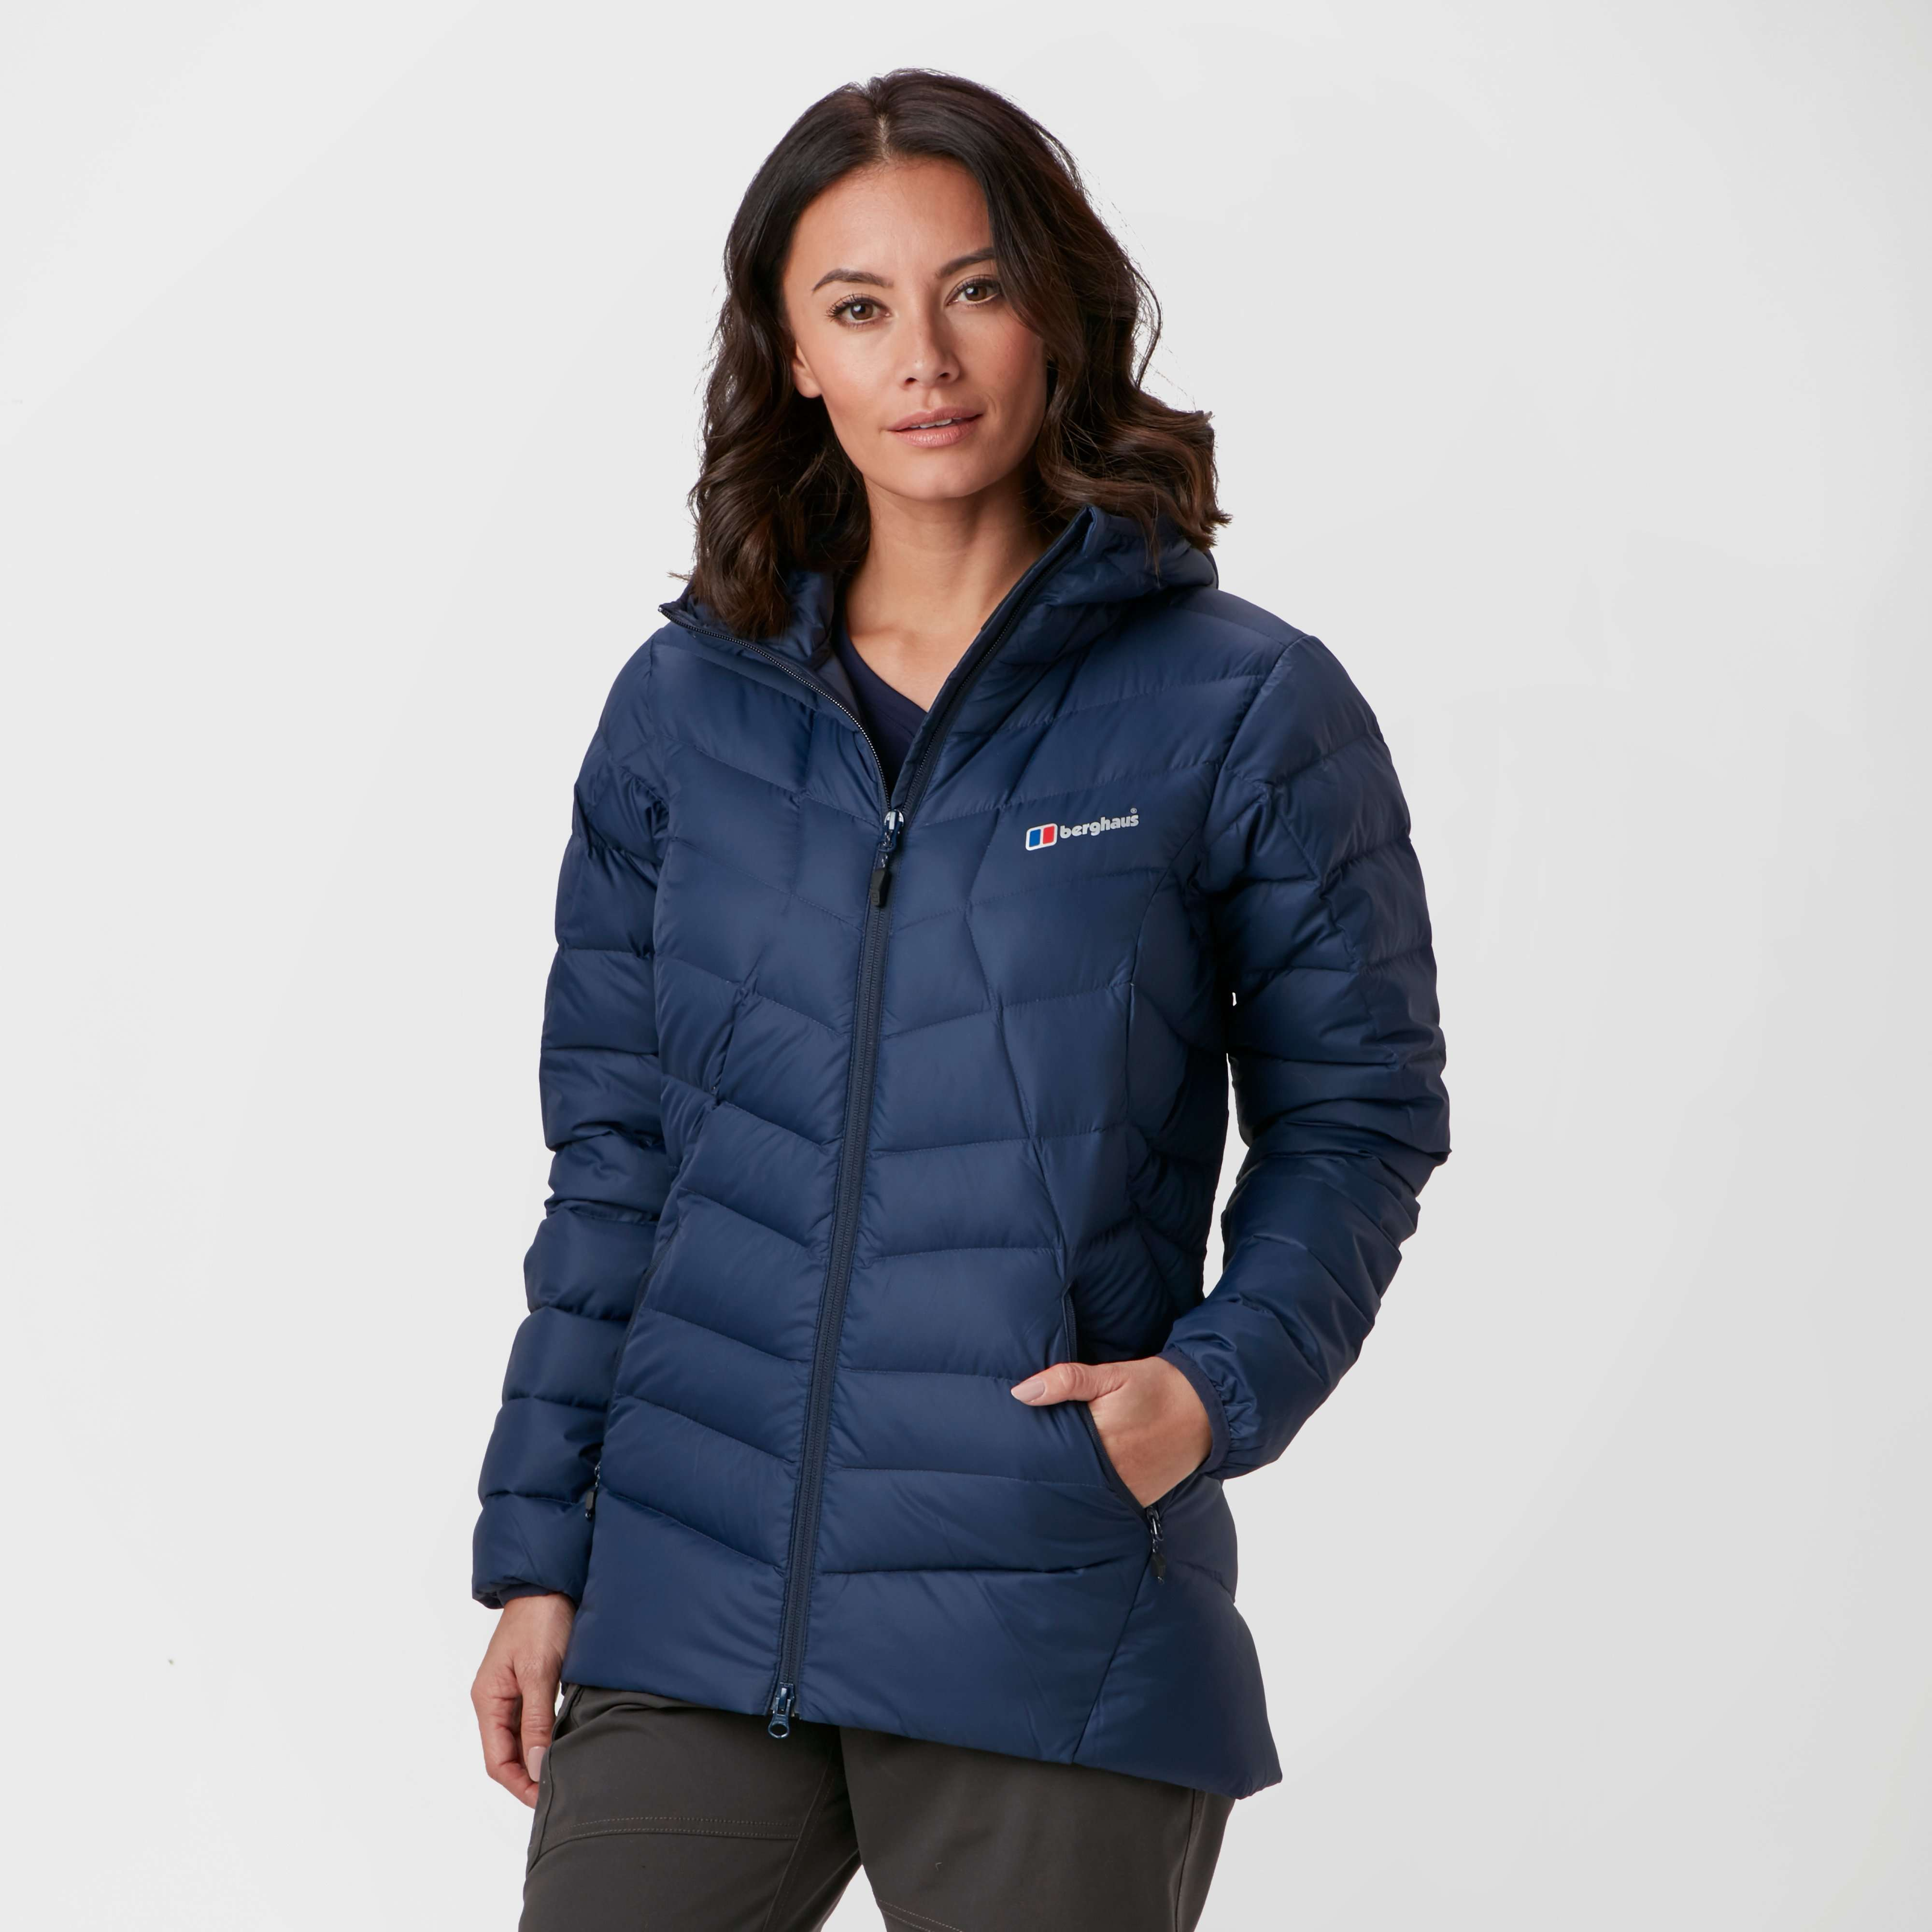 BERGHAUS Women's Pele Jacket